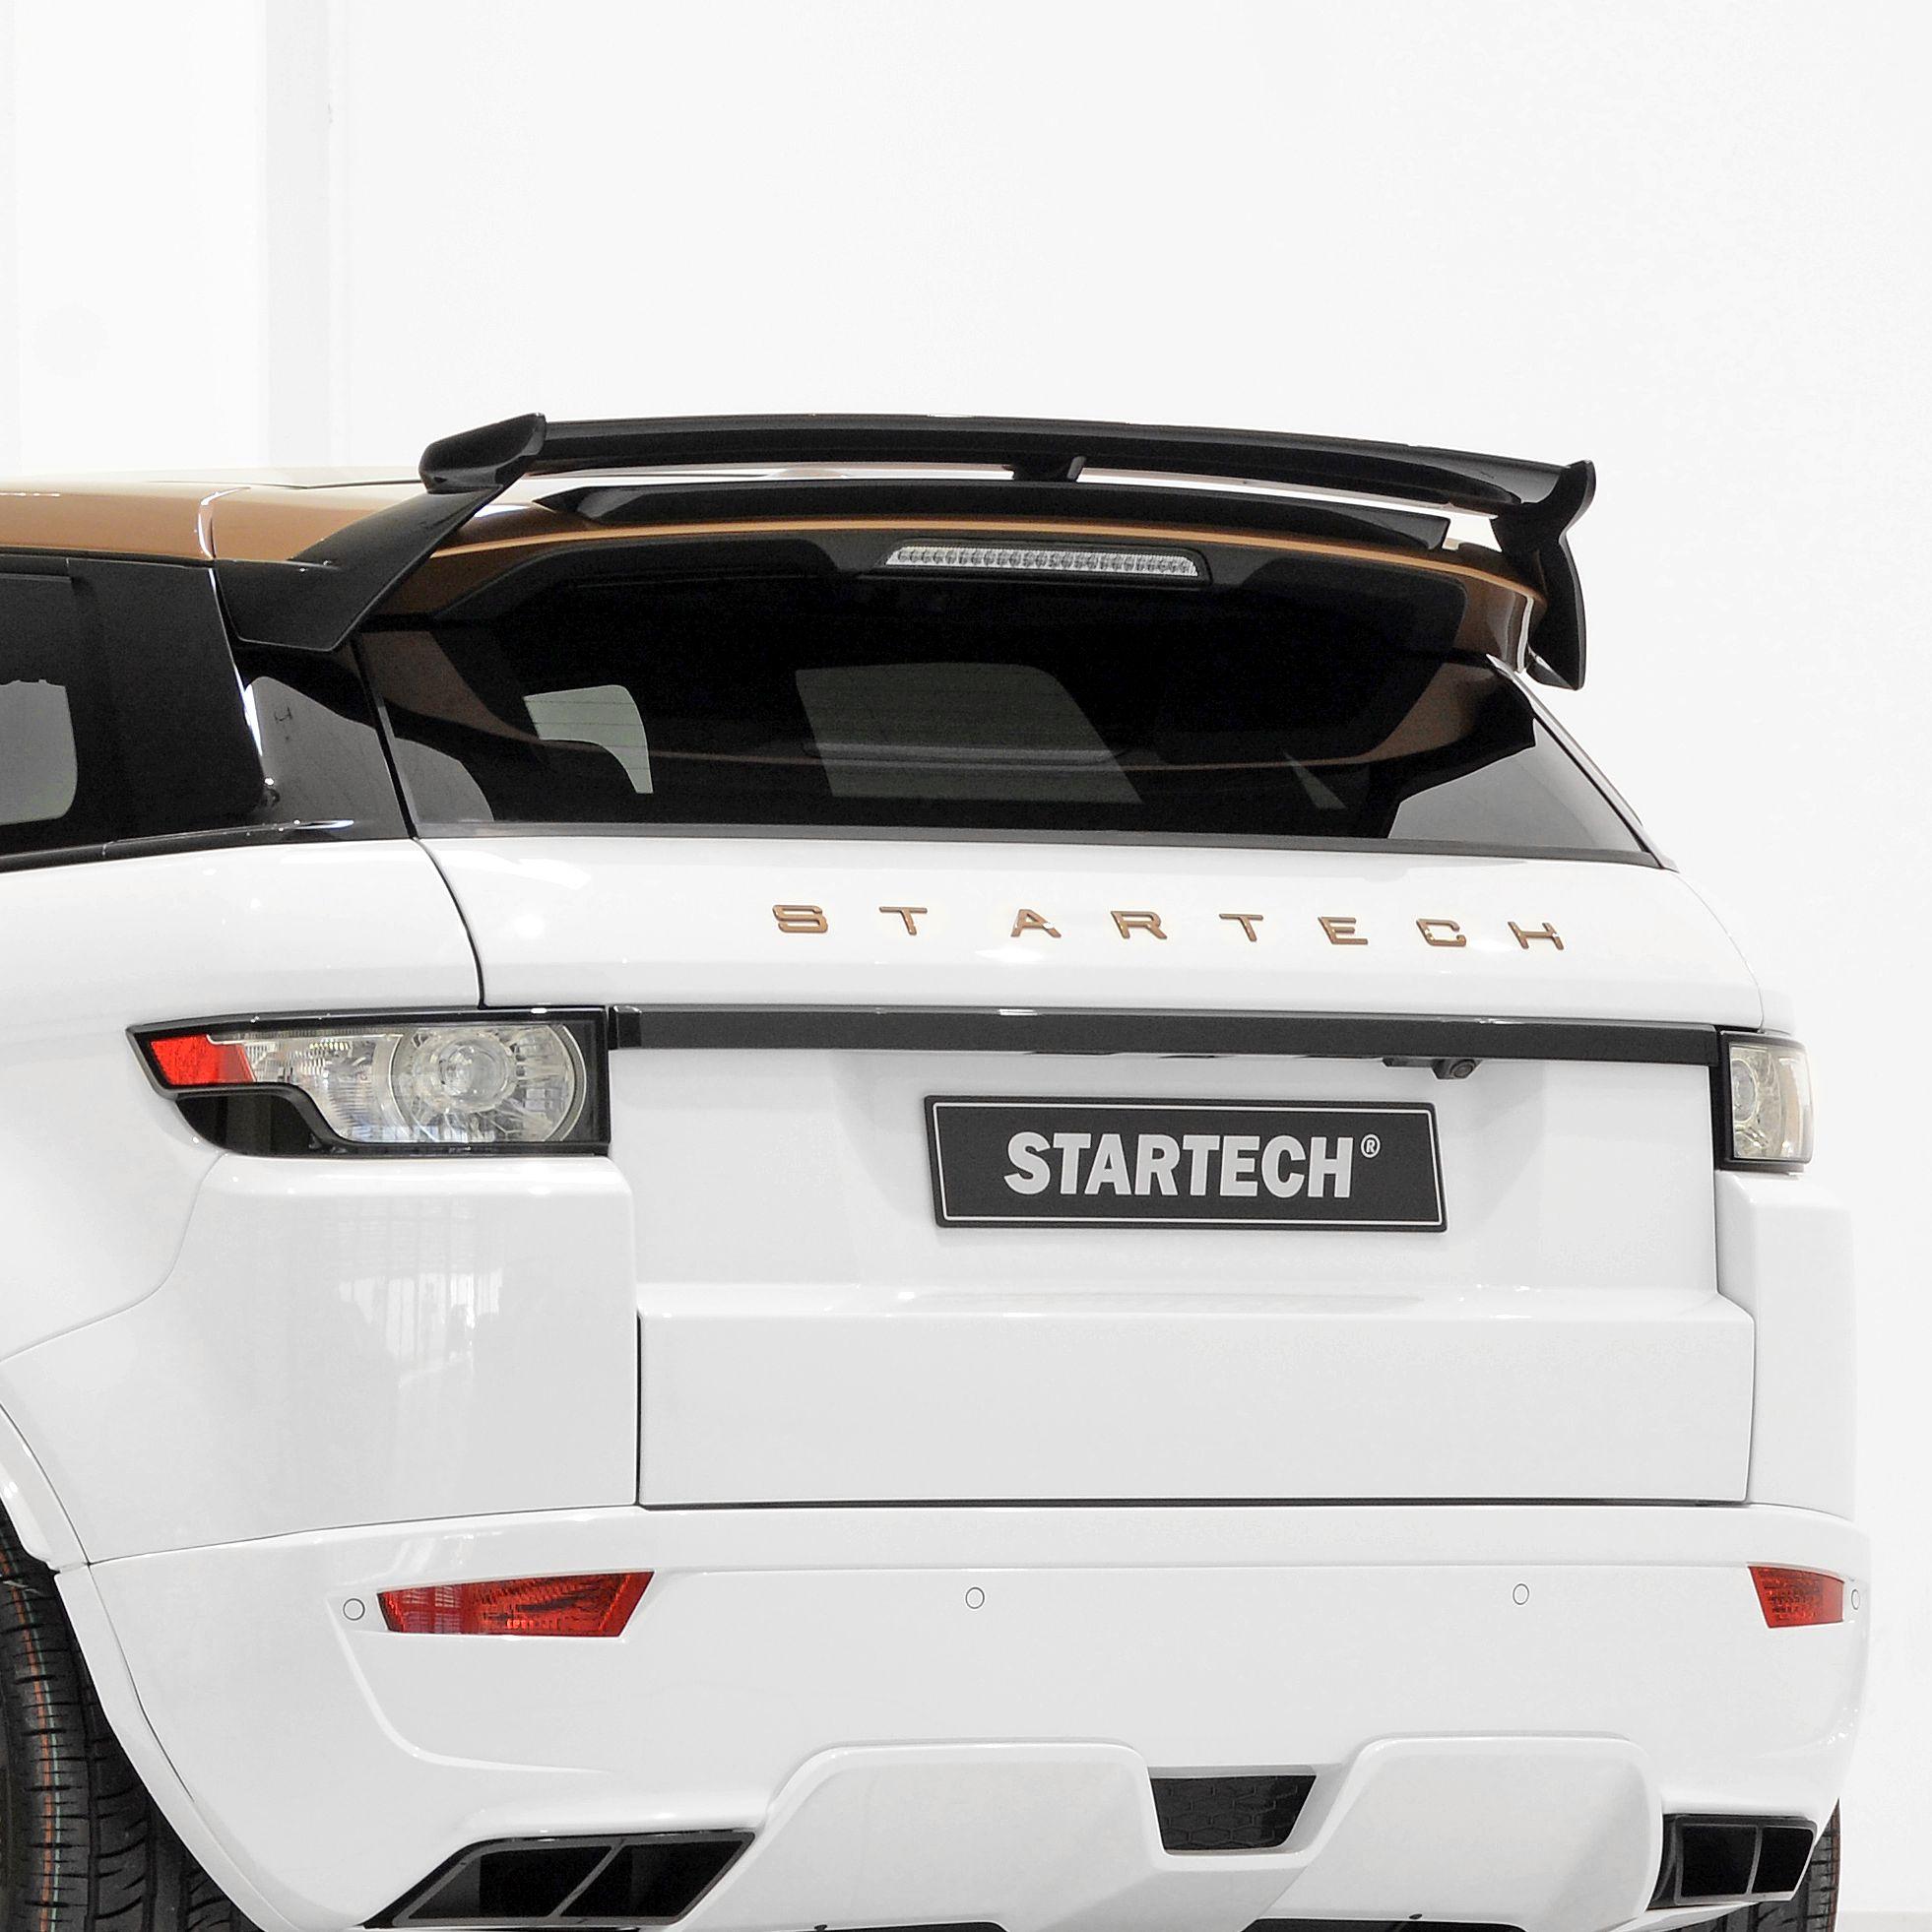 2011 Land Rover Range Rover Sport Exterior: Range Rover Evoque Tuning